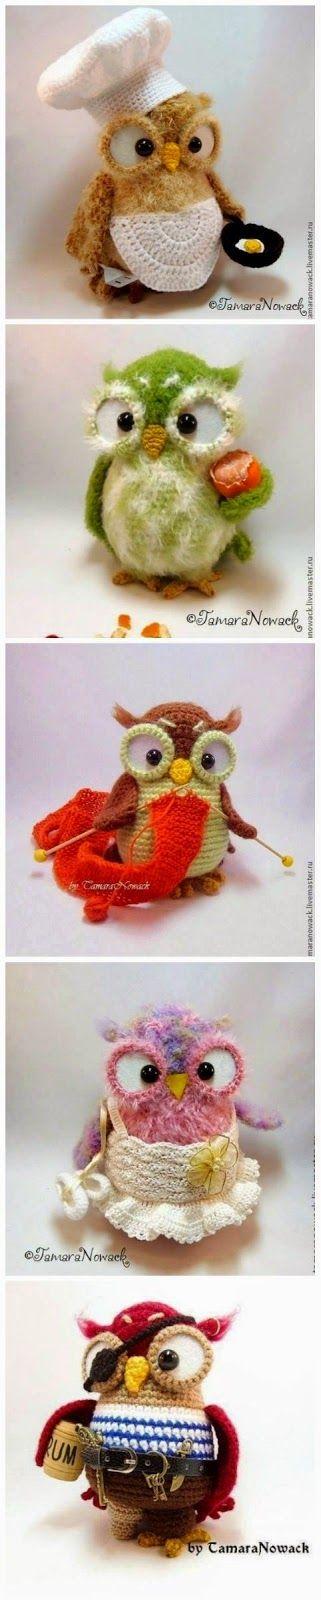 Owl Crochet Patterns                                                                                                                                                                                 More